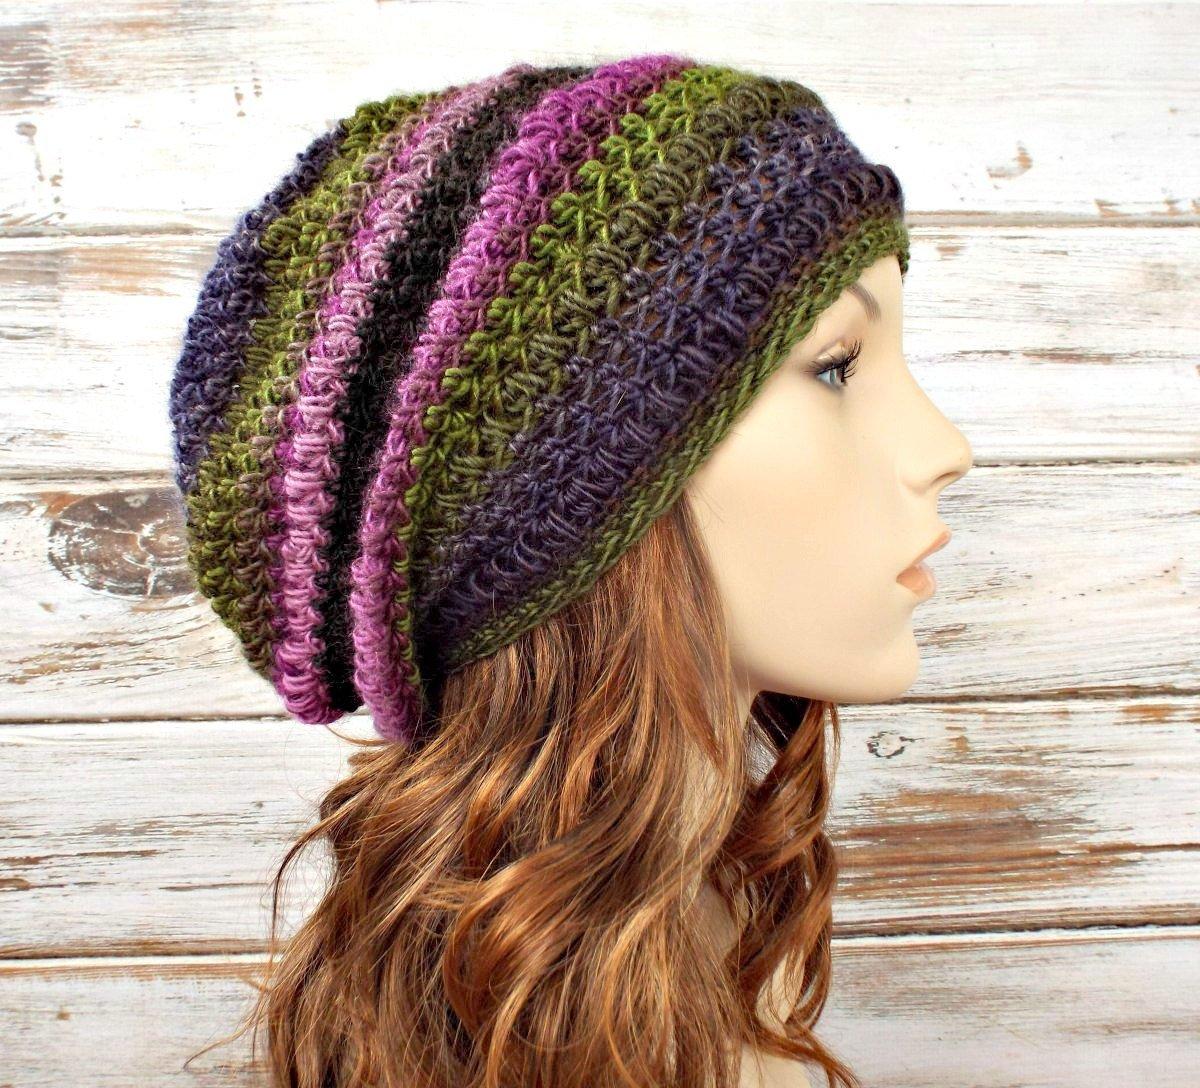 Womens Crochet Hat Womens Hat - Penelope Puff Stitch Slouchy Hat Purp… https://t.co/njIkMwfMjU #pixiebell #WomensHat https://t.co/d1S3pIf8Ys